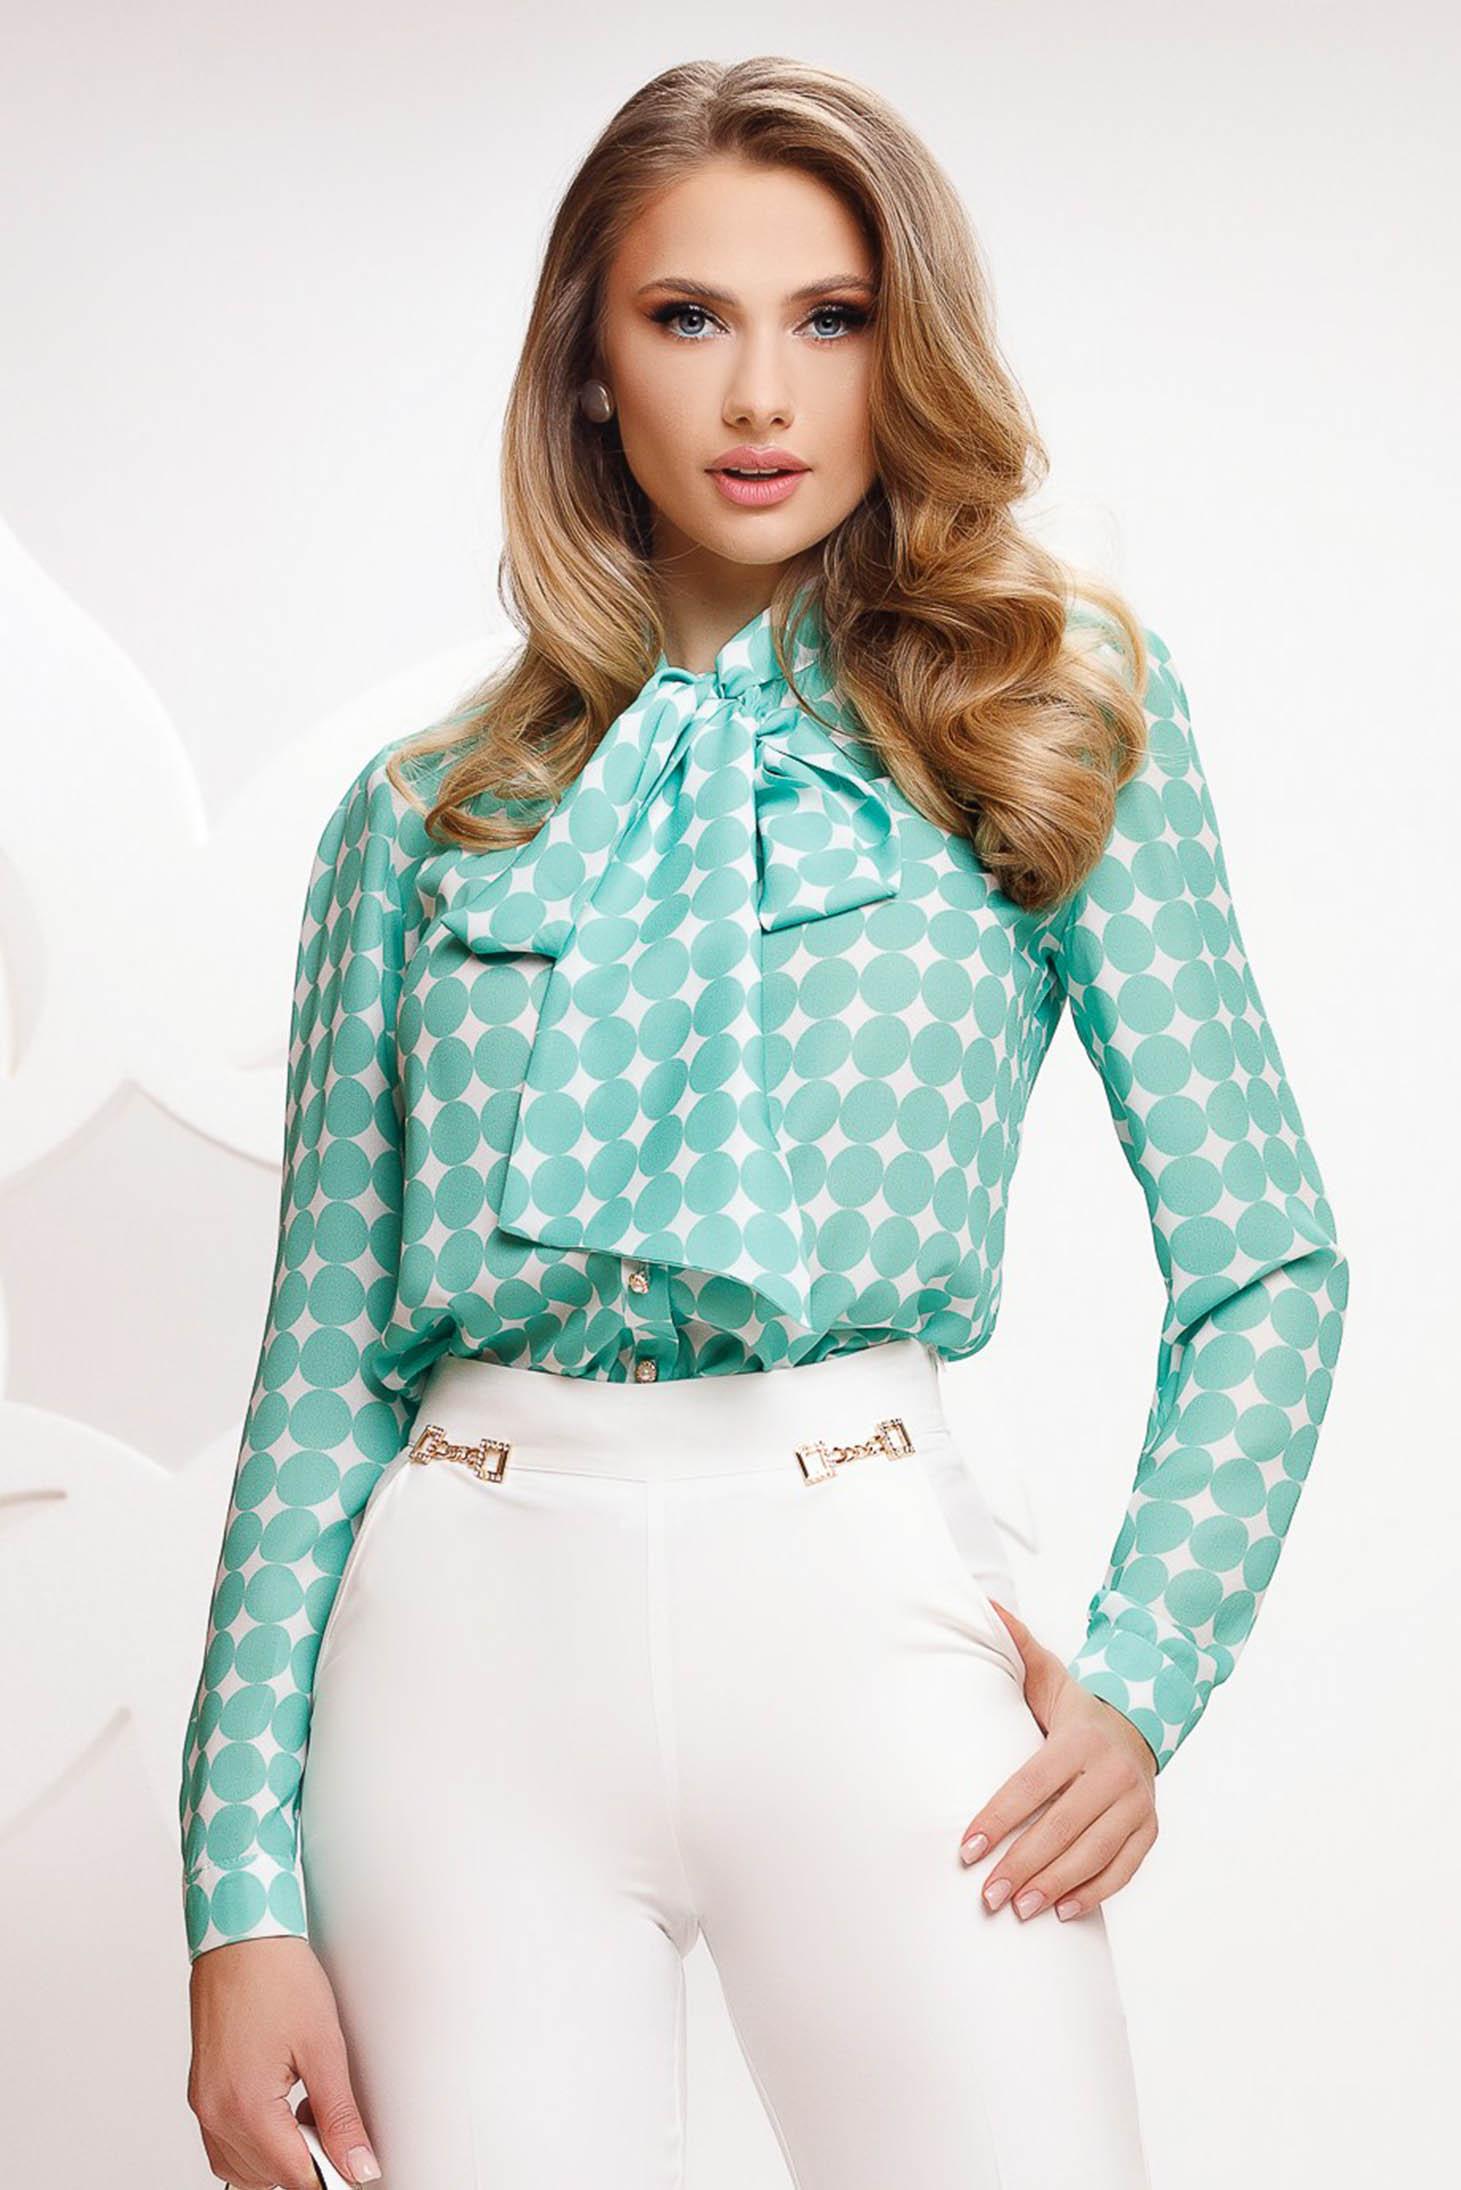 Bluza dama Fofy verde cu buline din voal cu croi larg care se leaga cu fundita